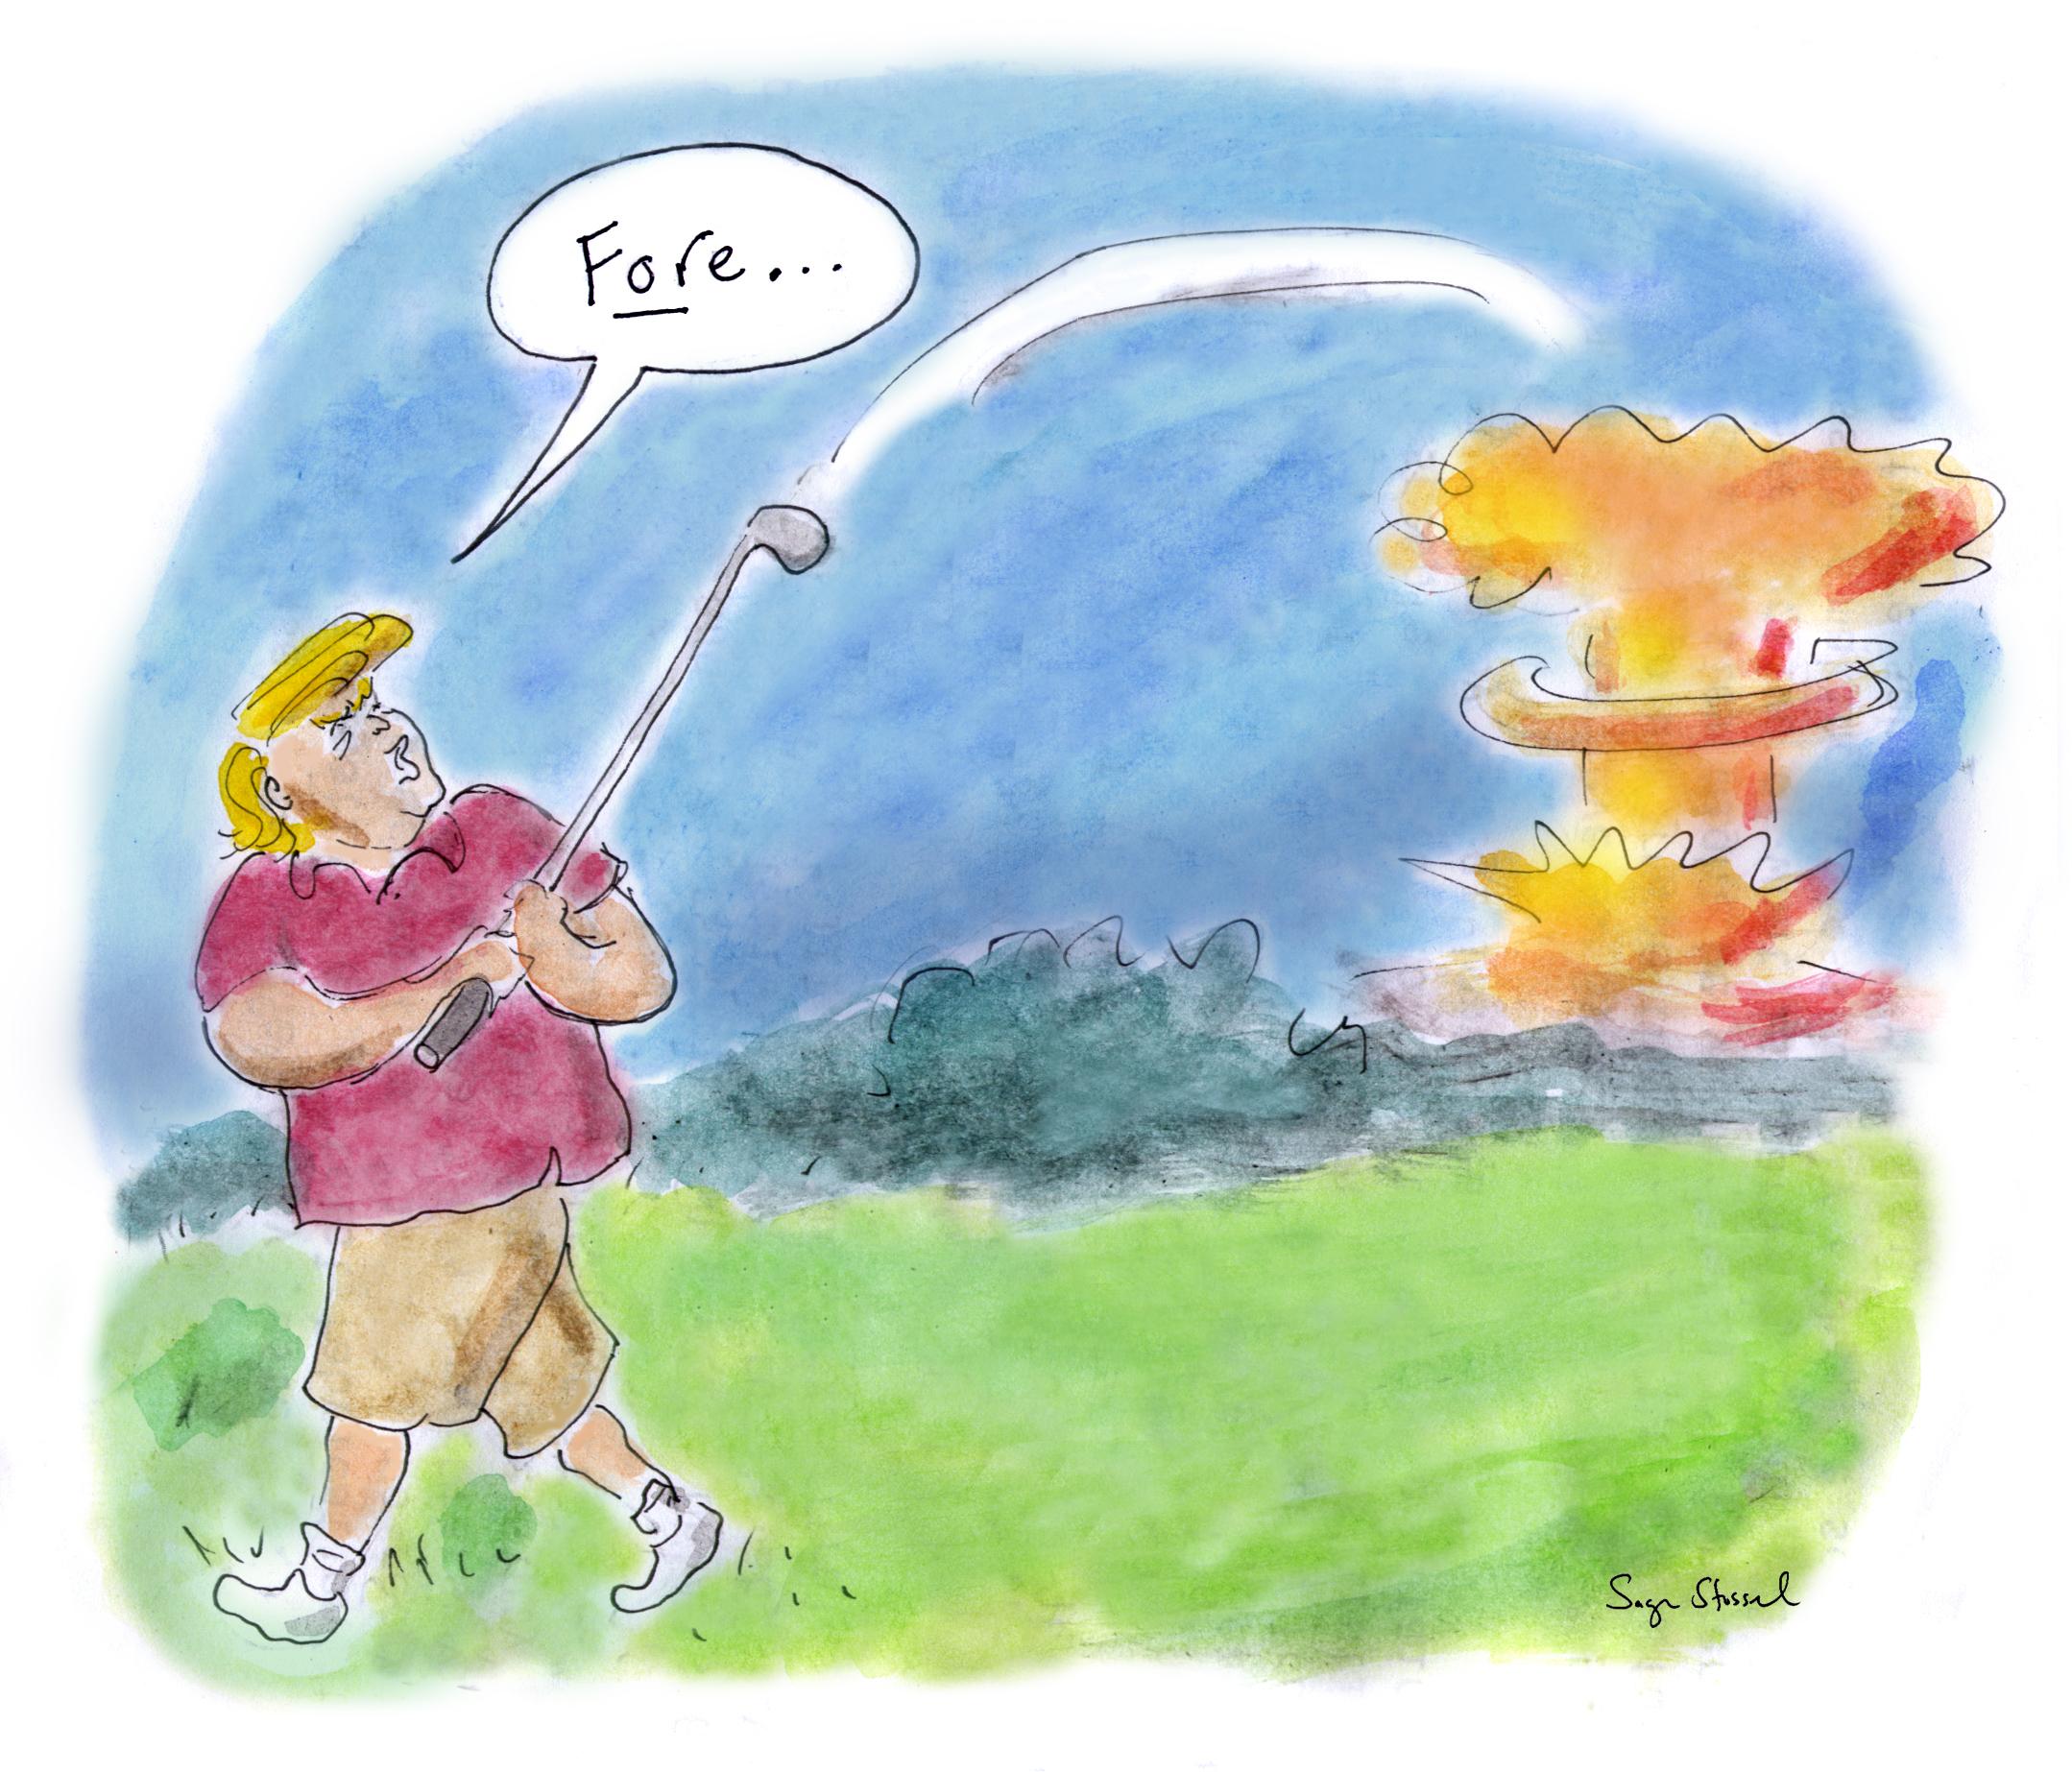 trump threaten north korea, fire and fury, guam, kim jong un, nuclear weapons, cartoon